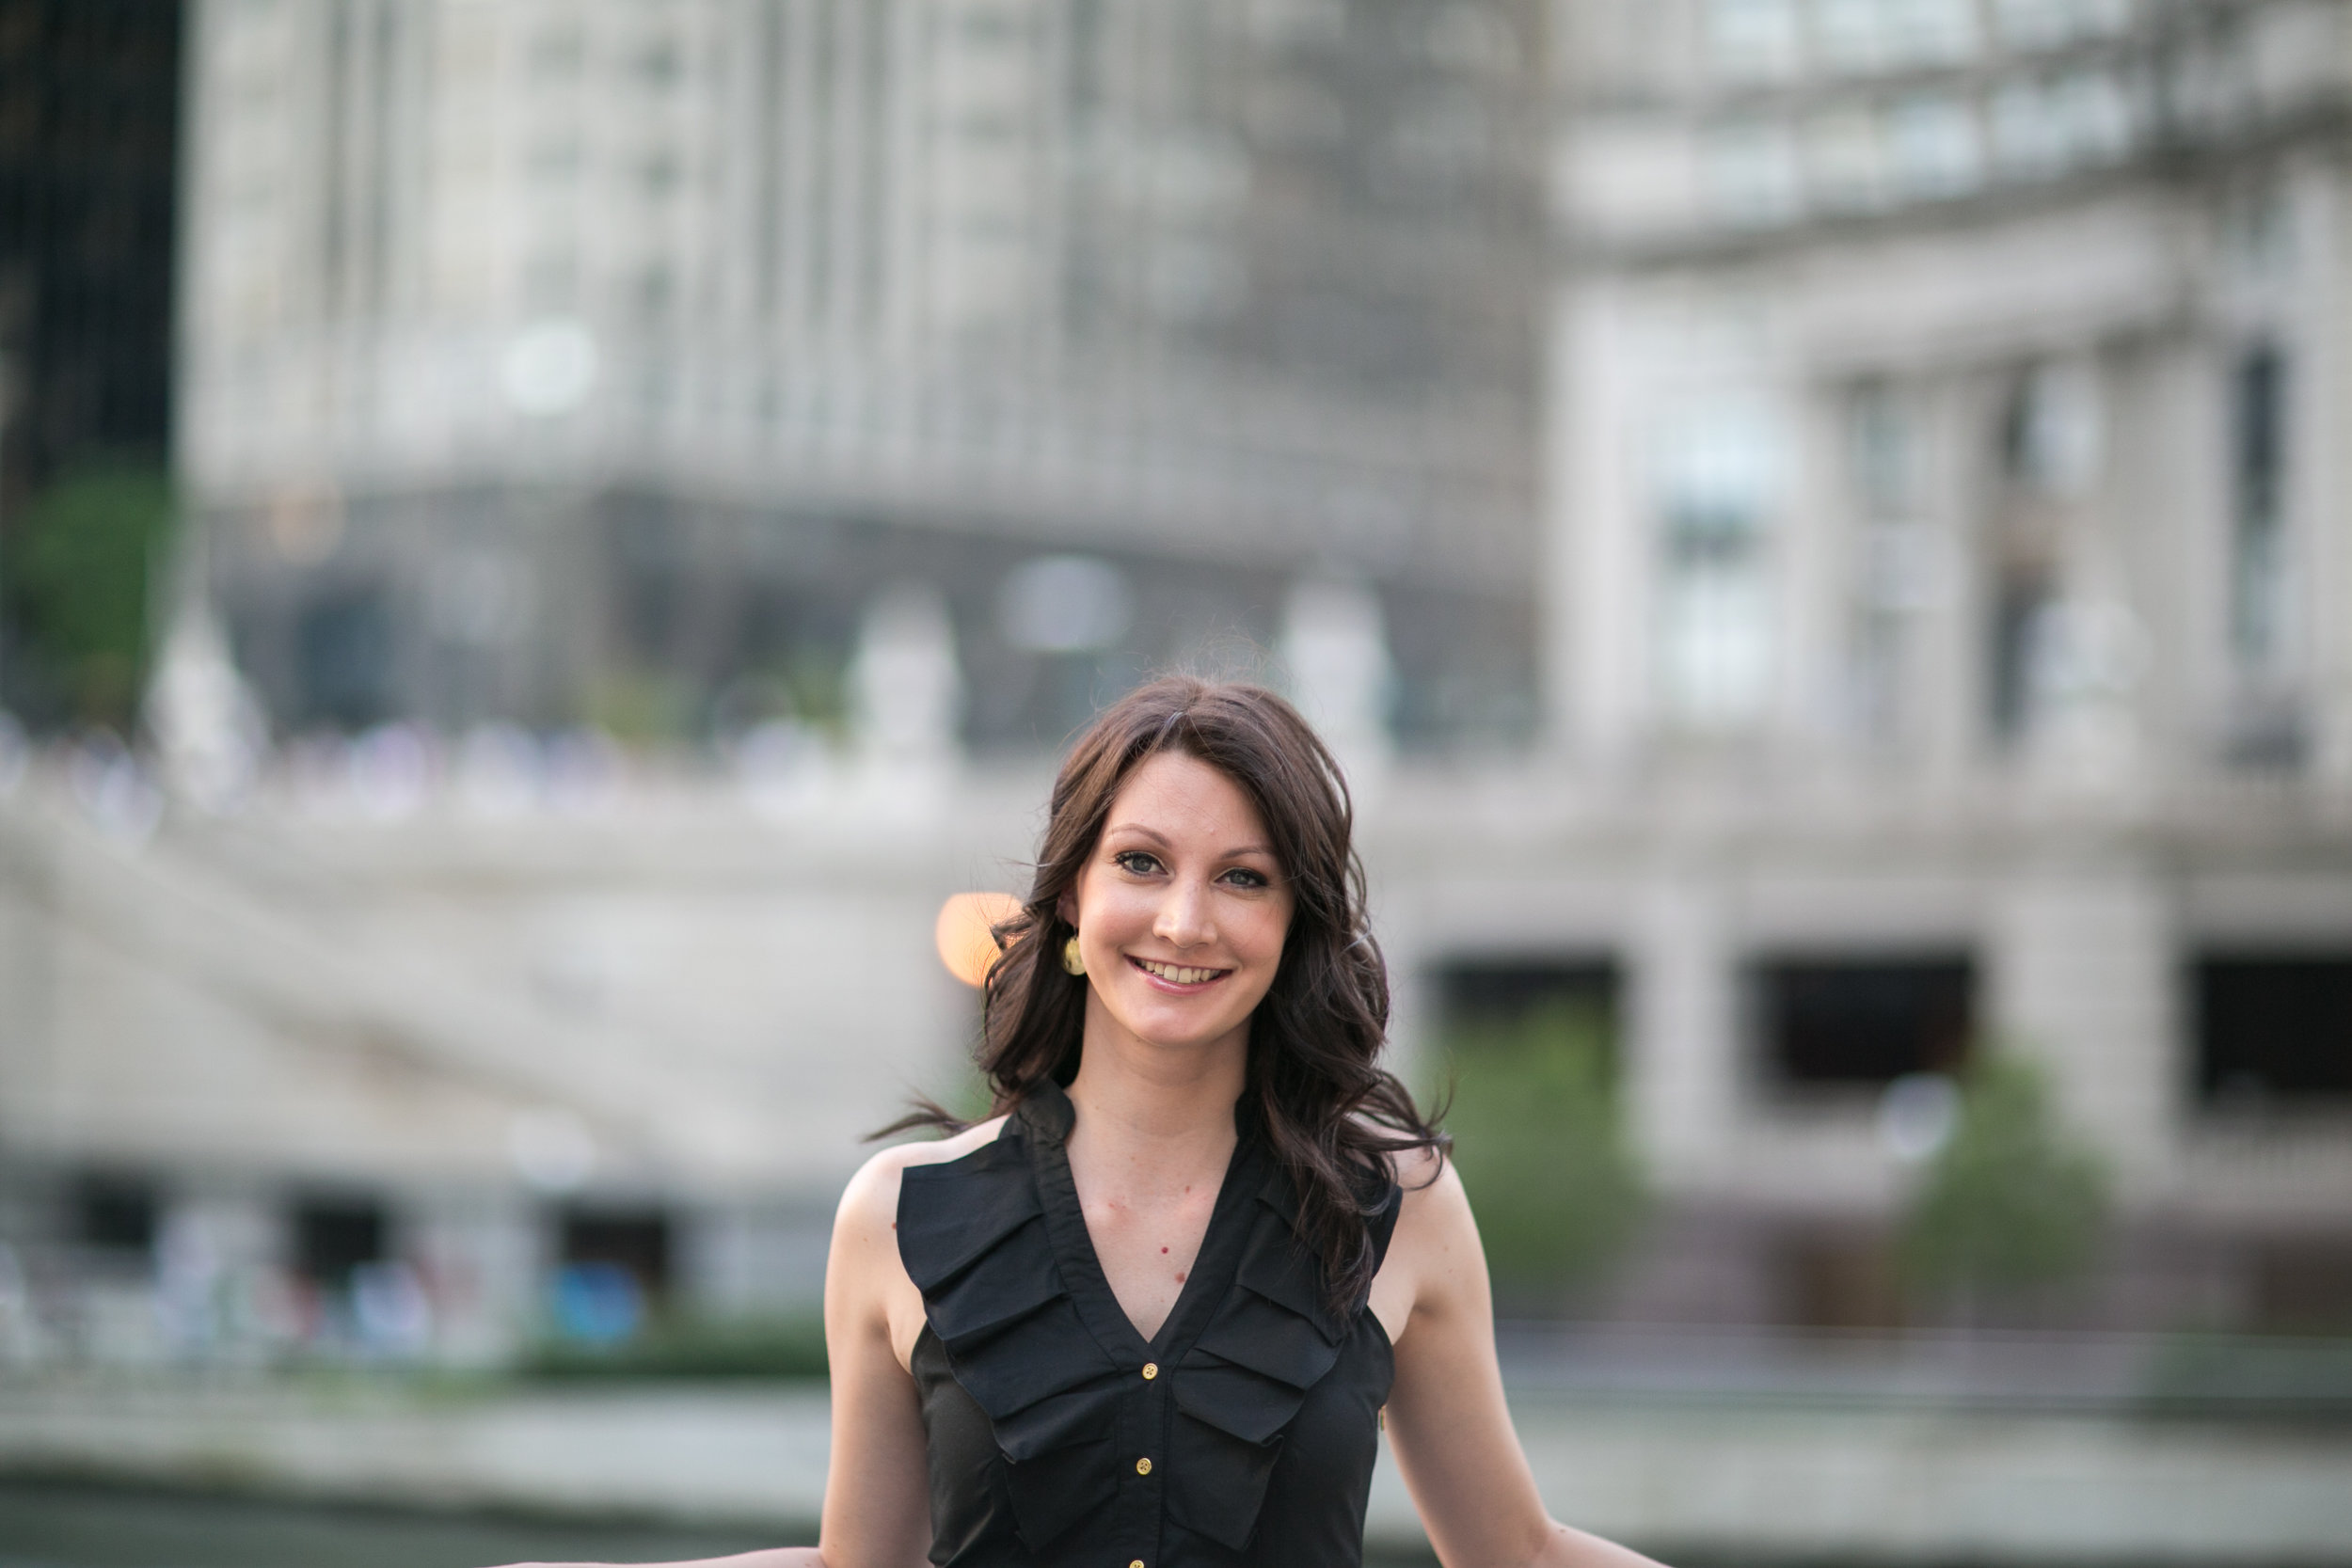 Lisa Russell Headshot 1.jpg